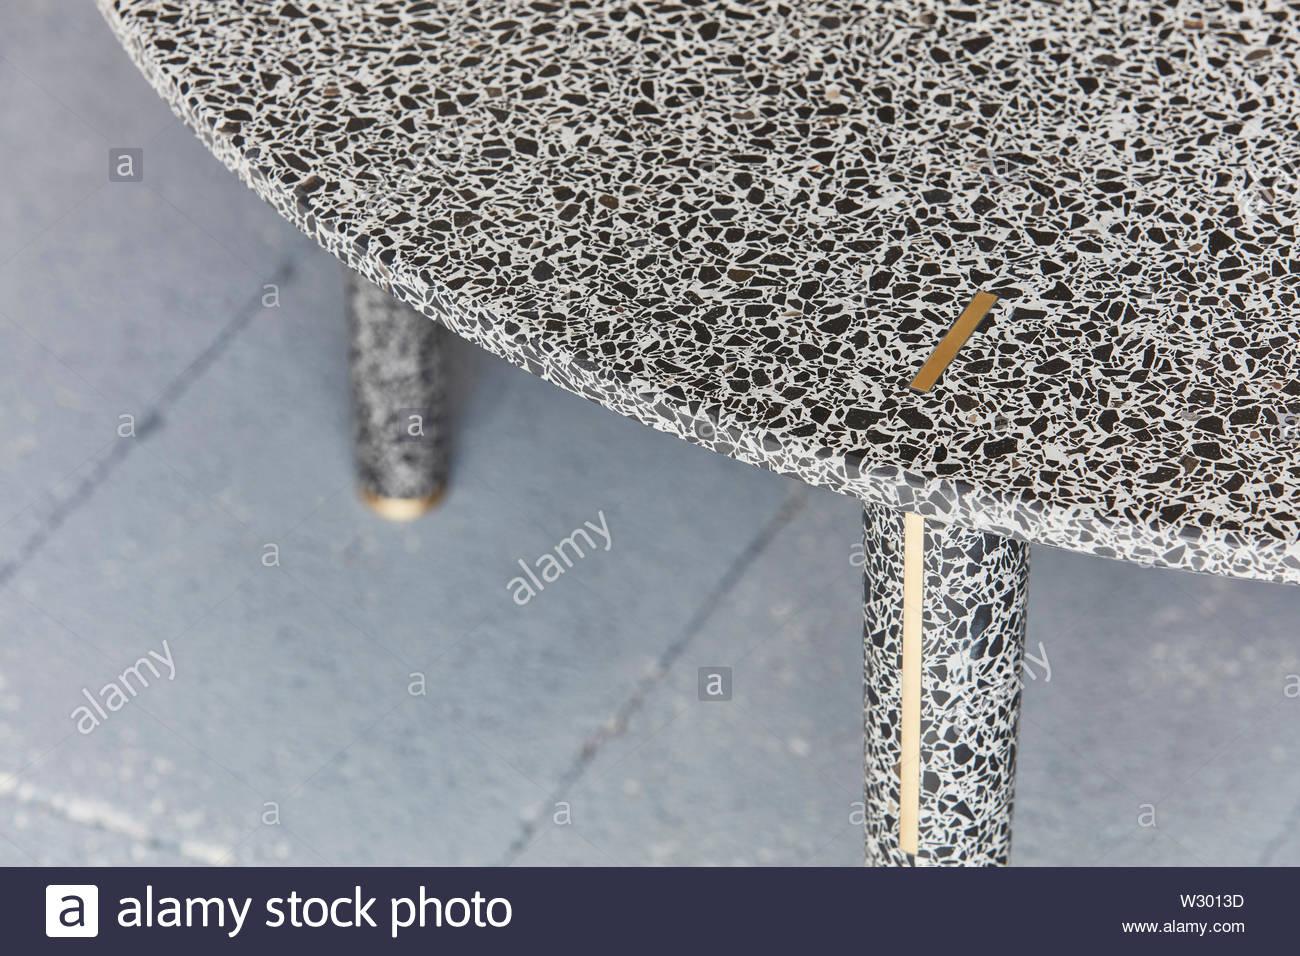 Table detail in showroom. Joyce Wang Showroom, London, United Kingdom. Architect: n/a, 2018. - Stock Image